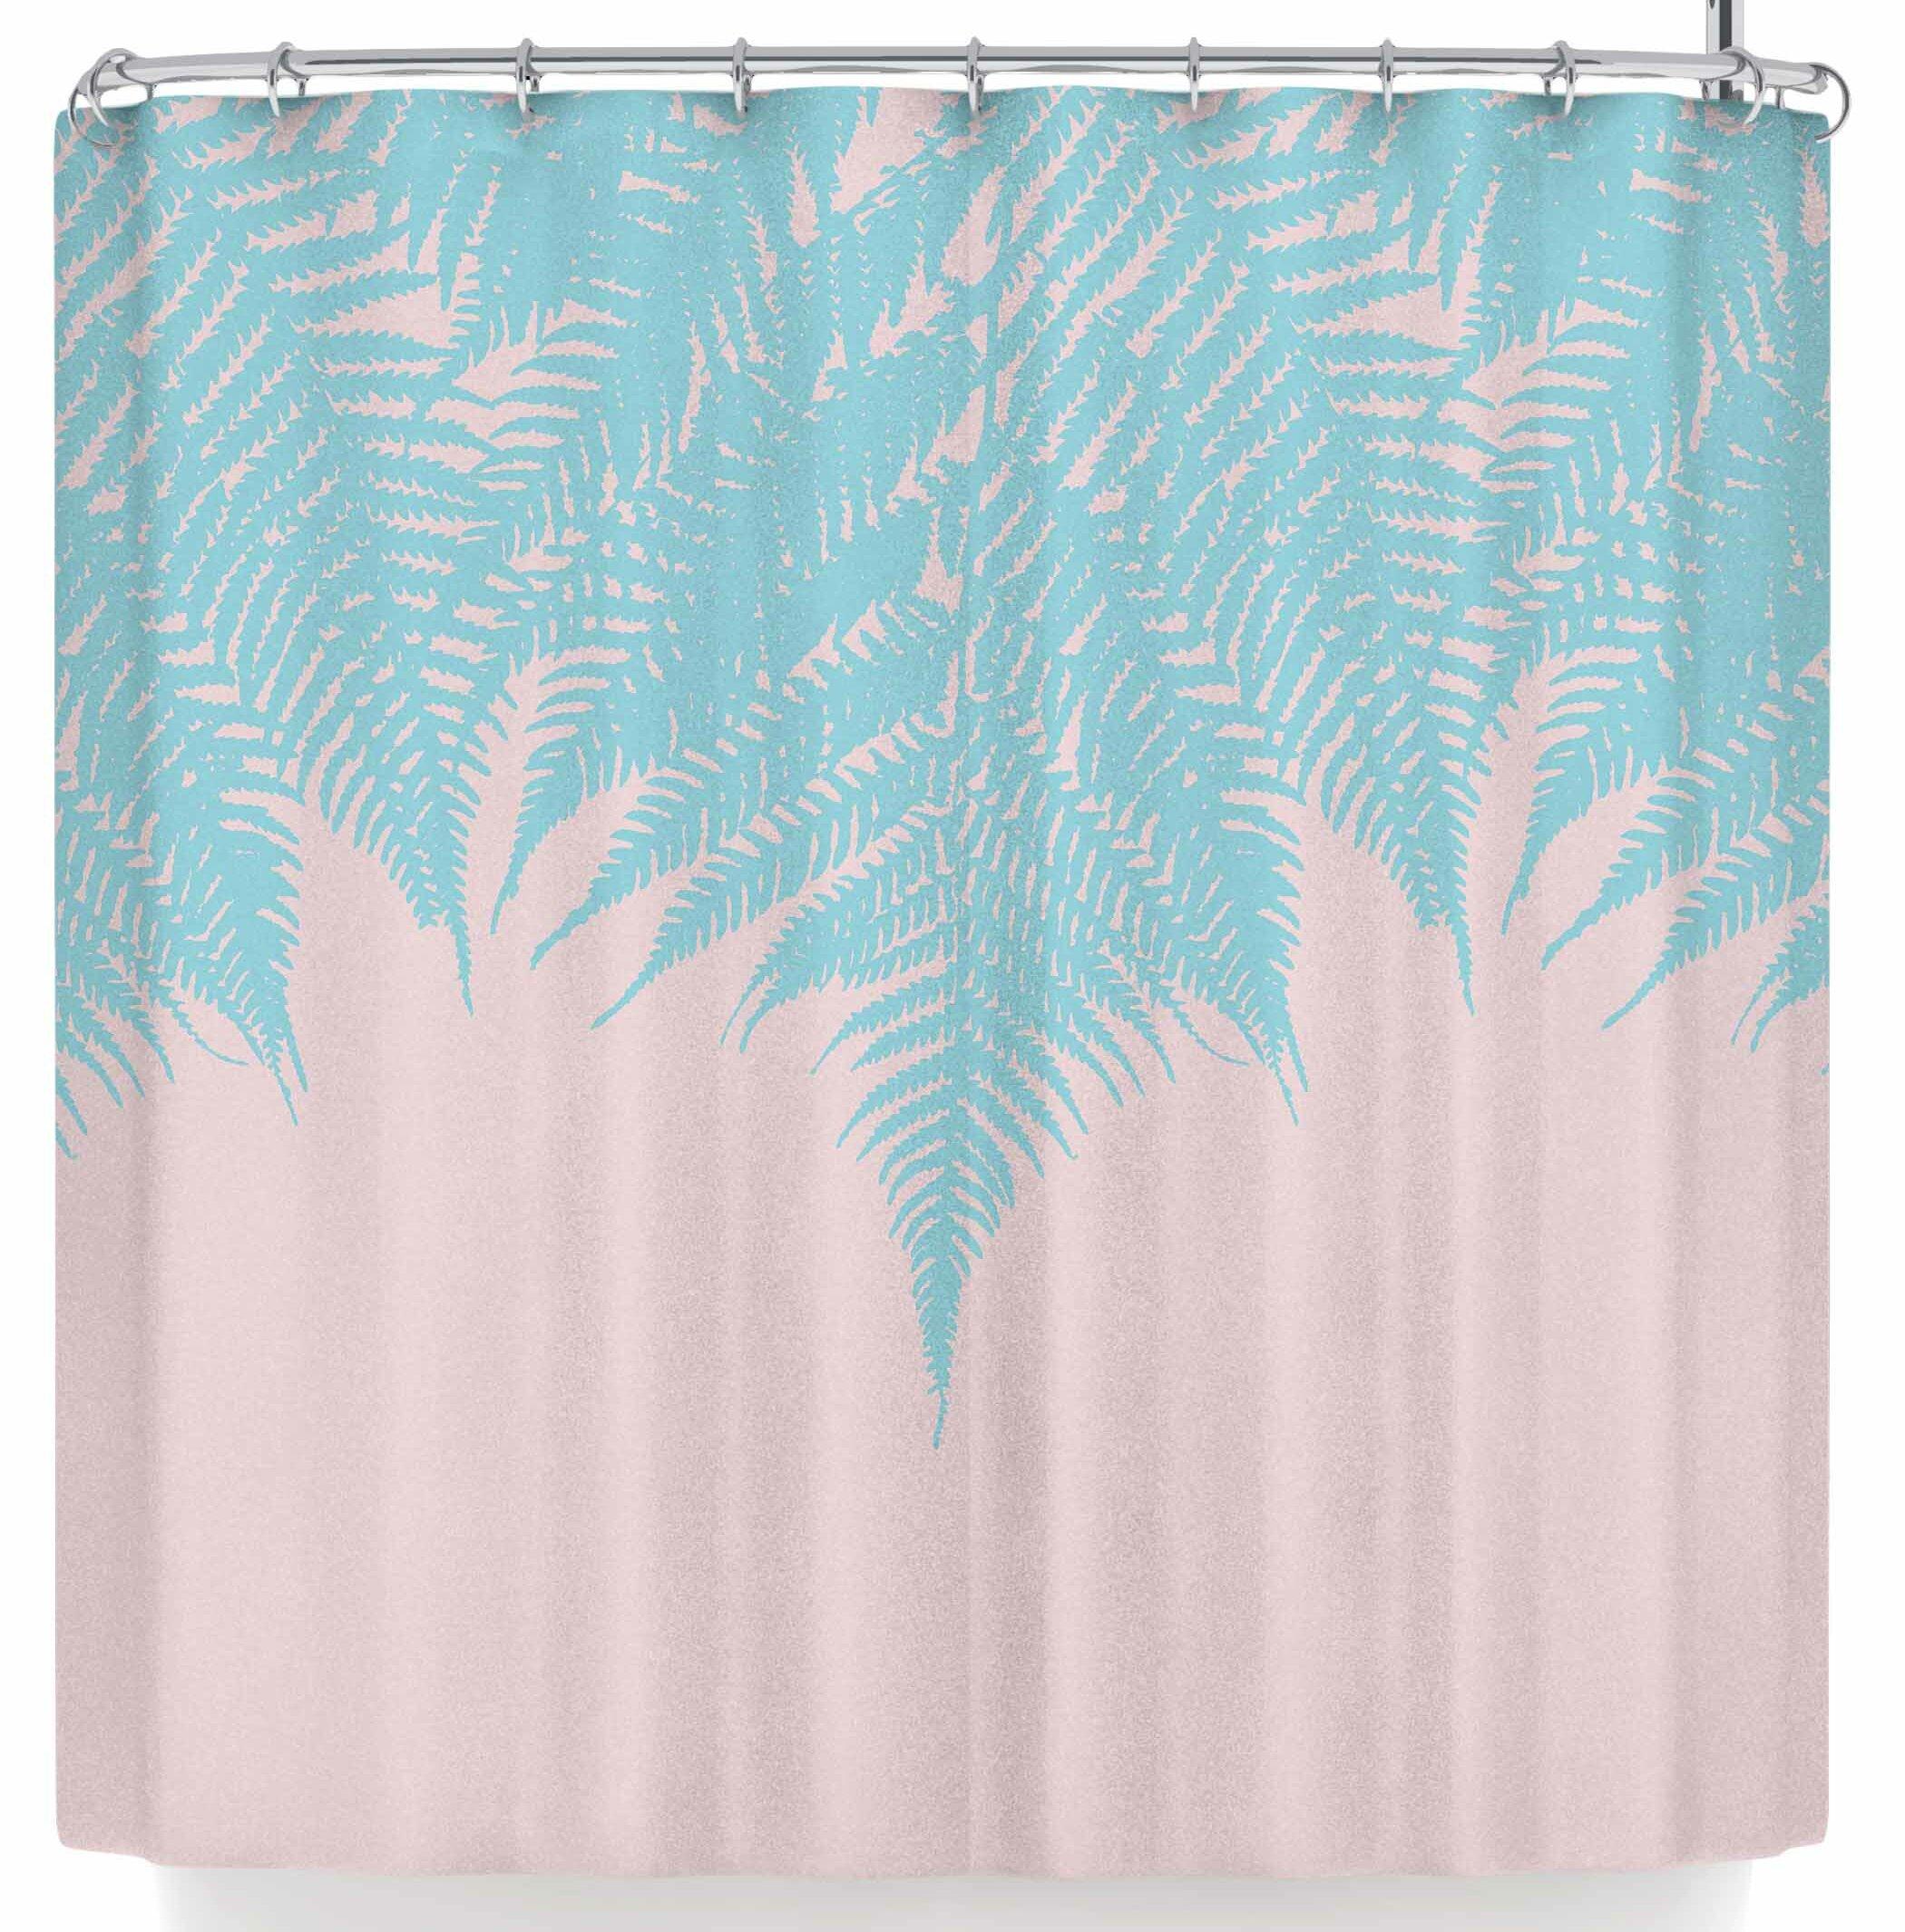 East Urban Home Project M Fern Shower Curtain & Reviews | Wayfair